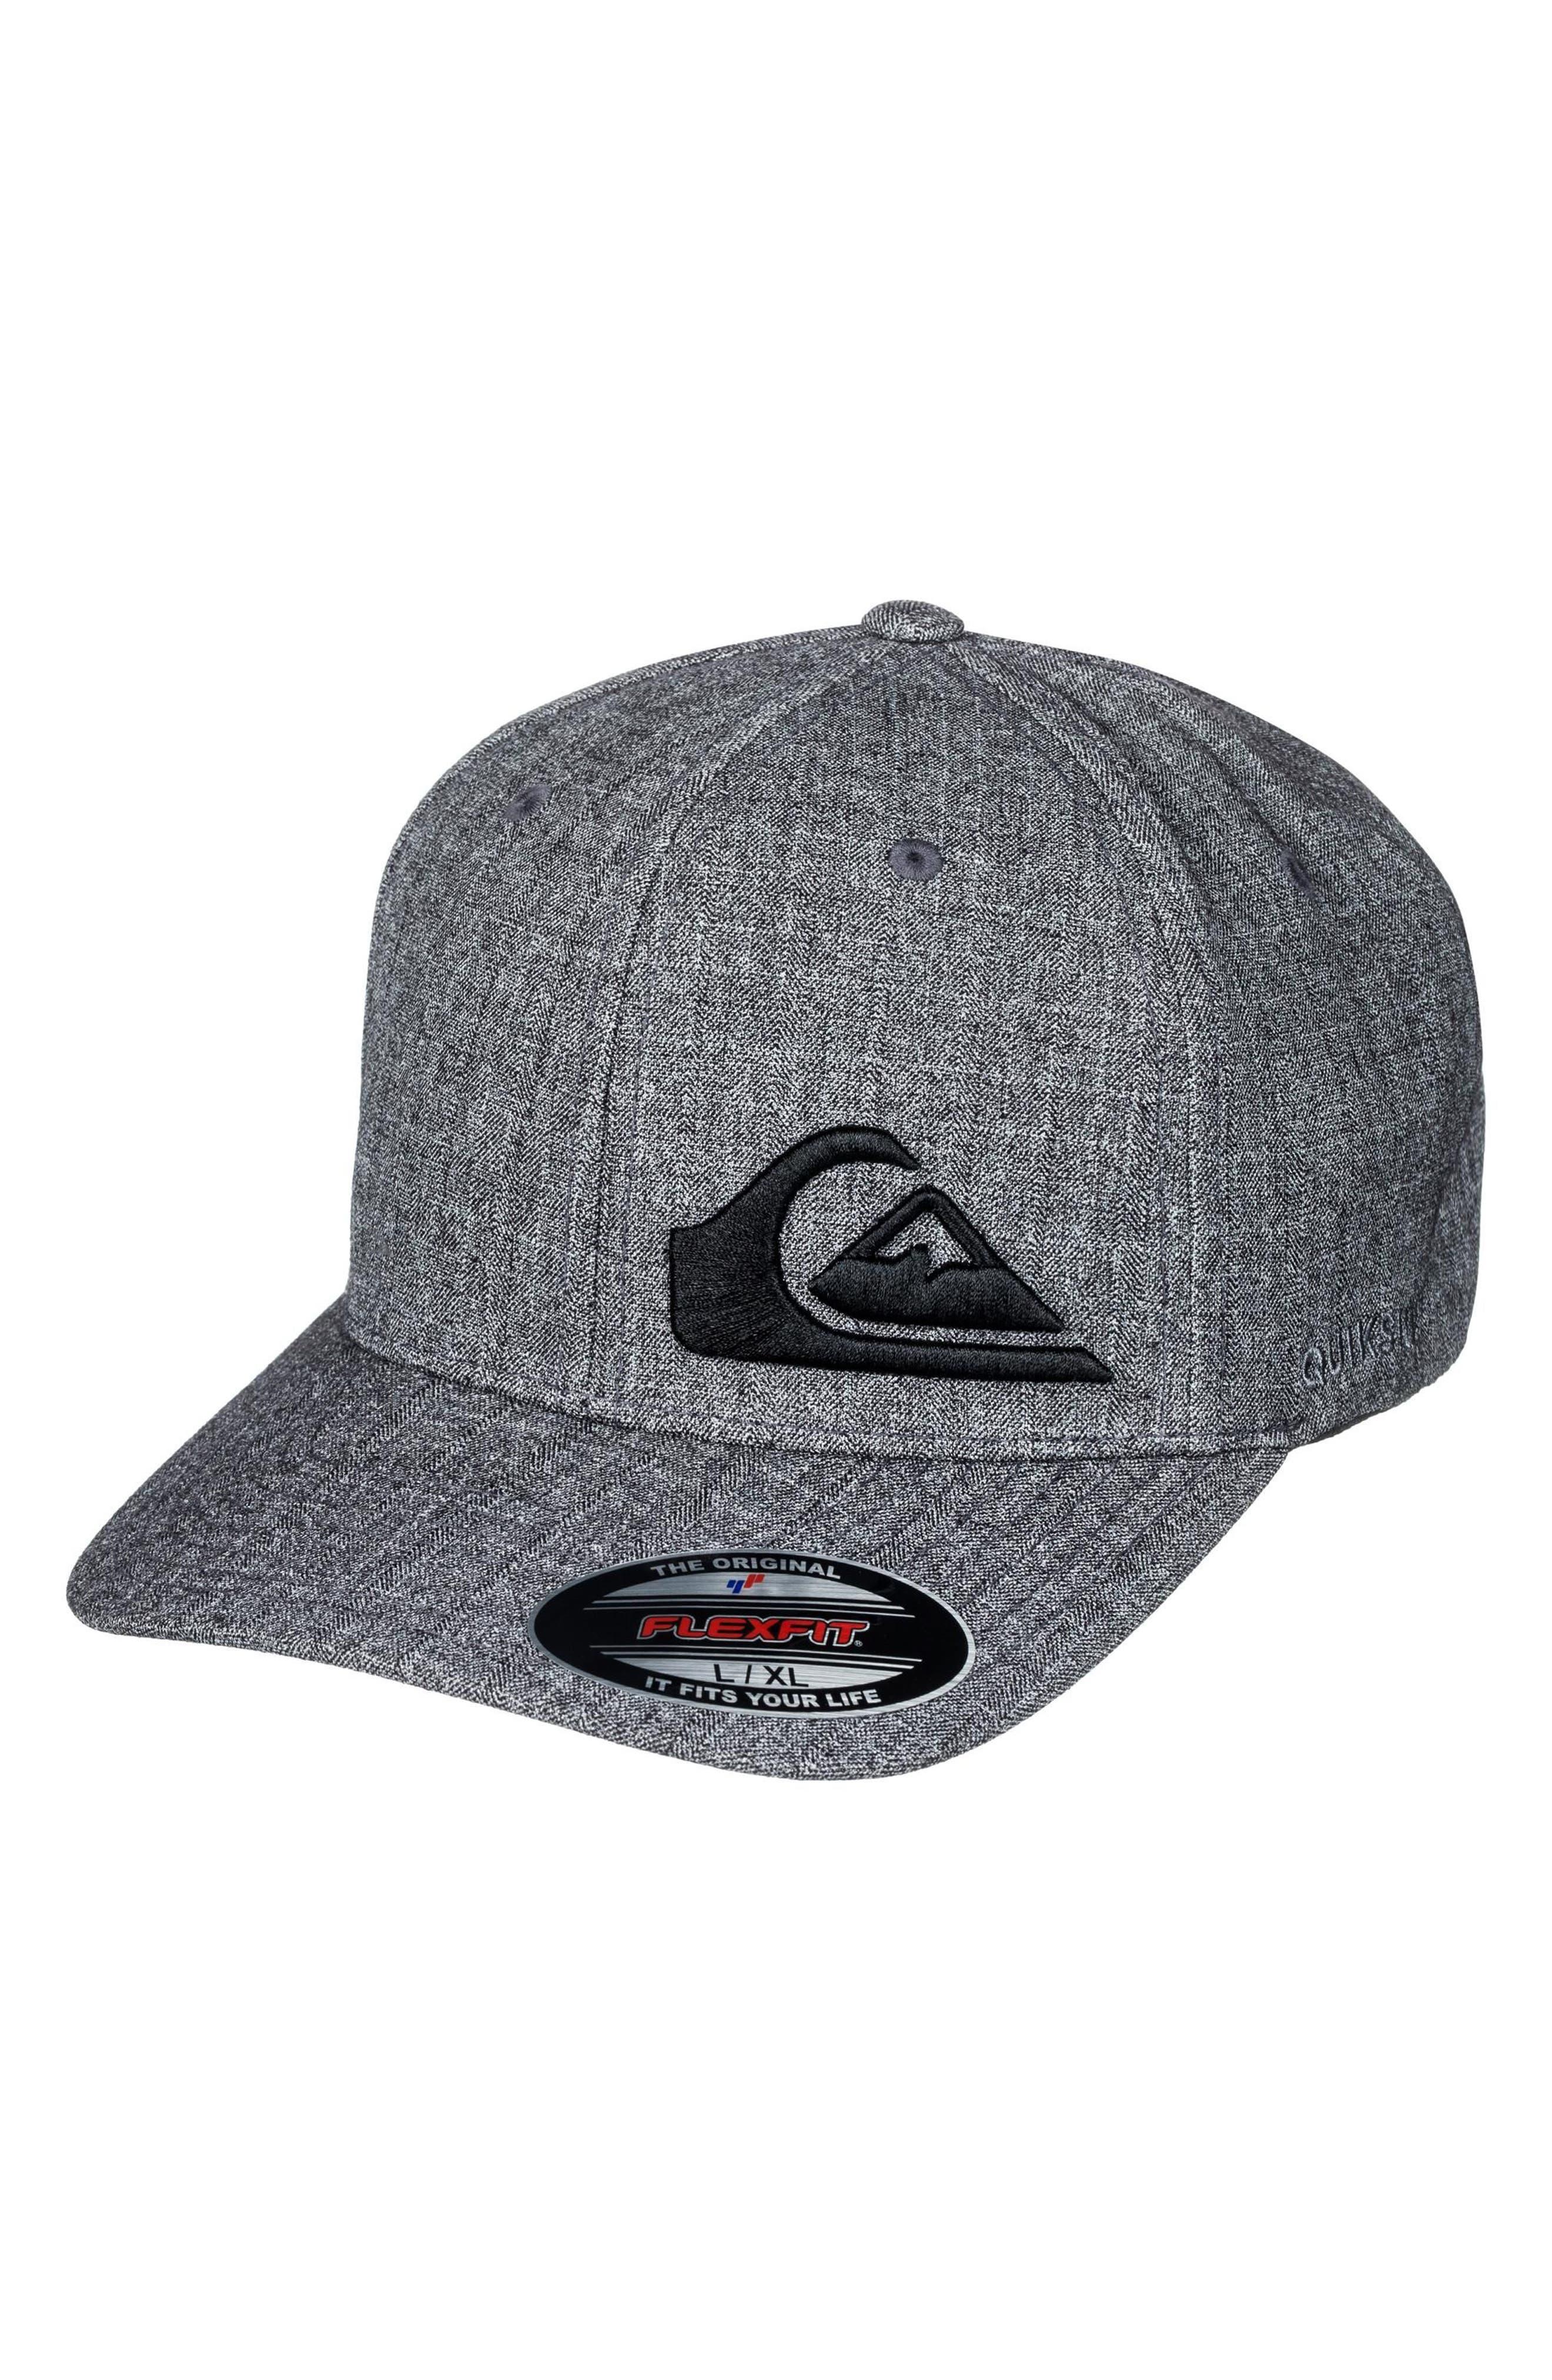 Final Flexfit Ball Cap,                         Main,                         color, 028